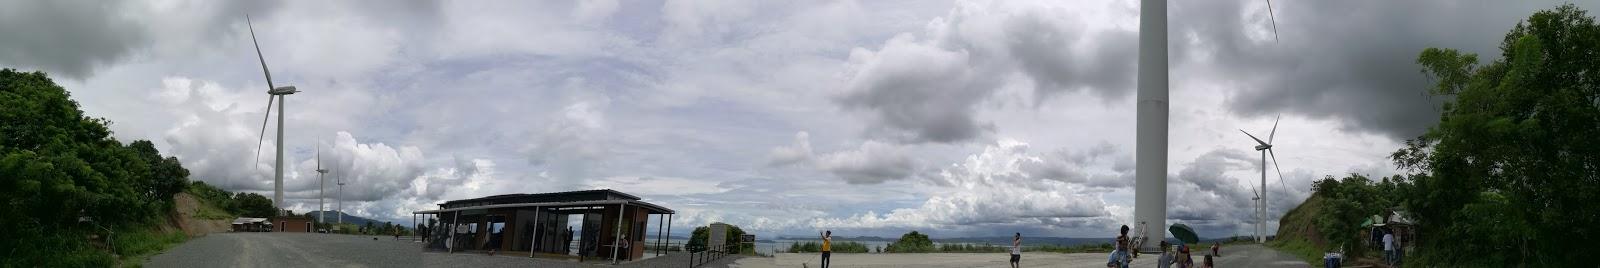 Huawei P9 Sample Camera Shot - Panorama (Complete Frames)